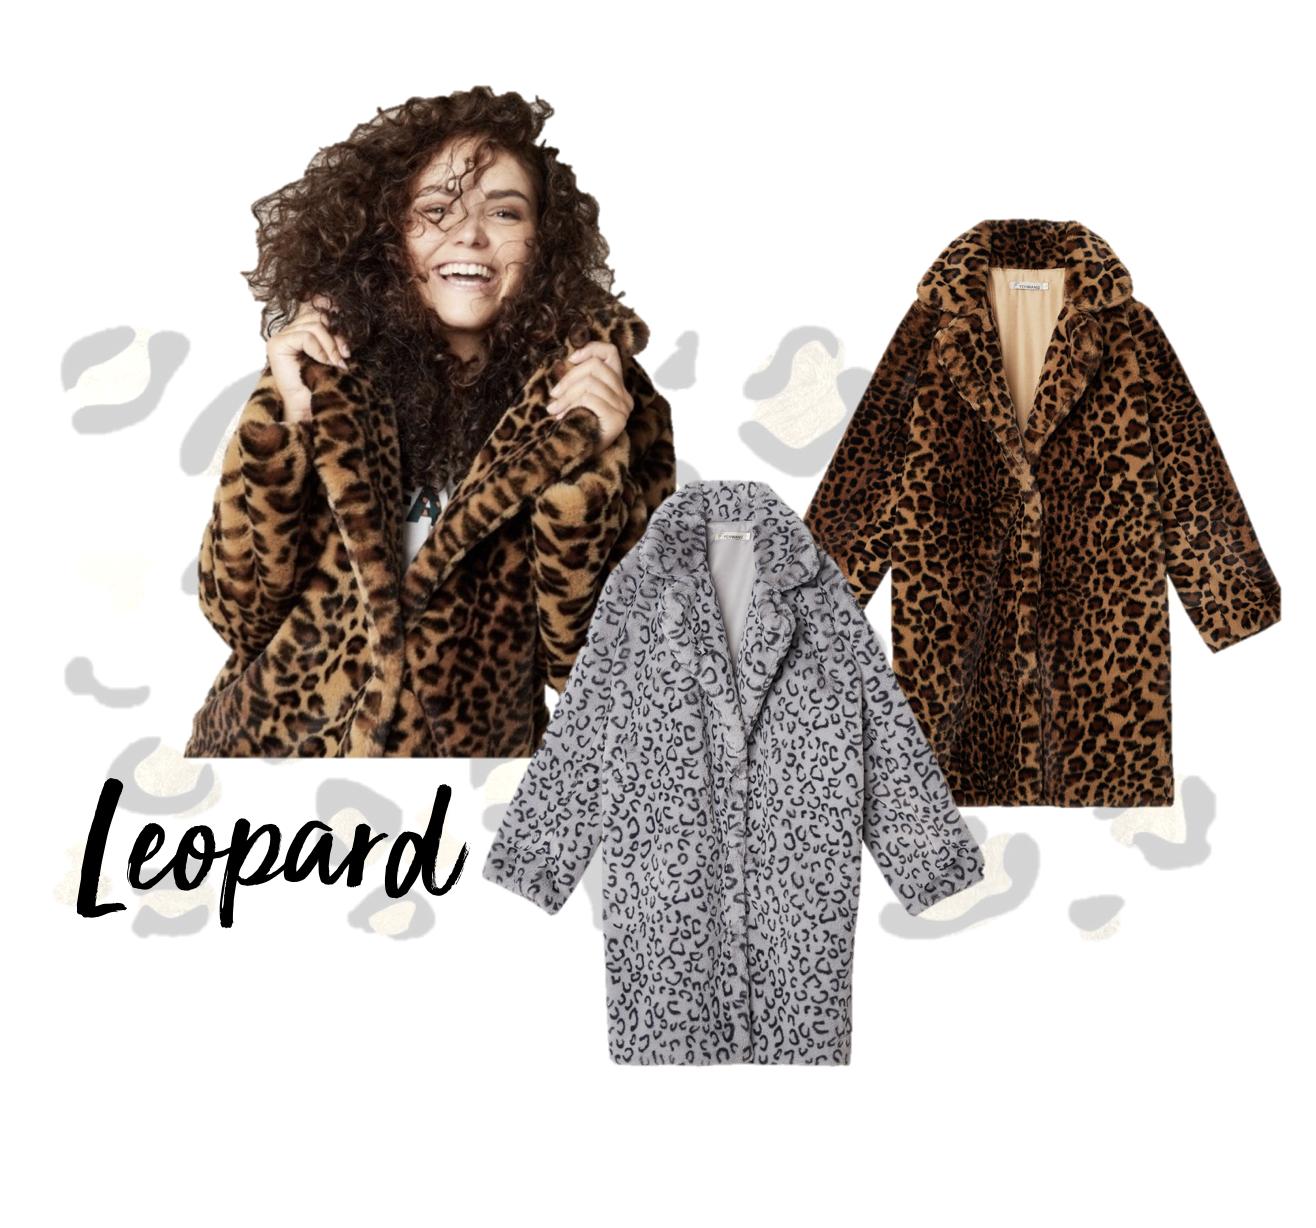 leopard print faux fur jassen bruin grijs nepbont herfst trend